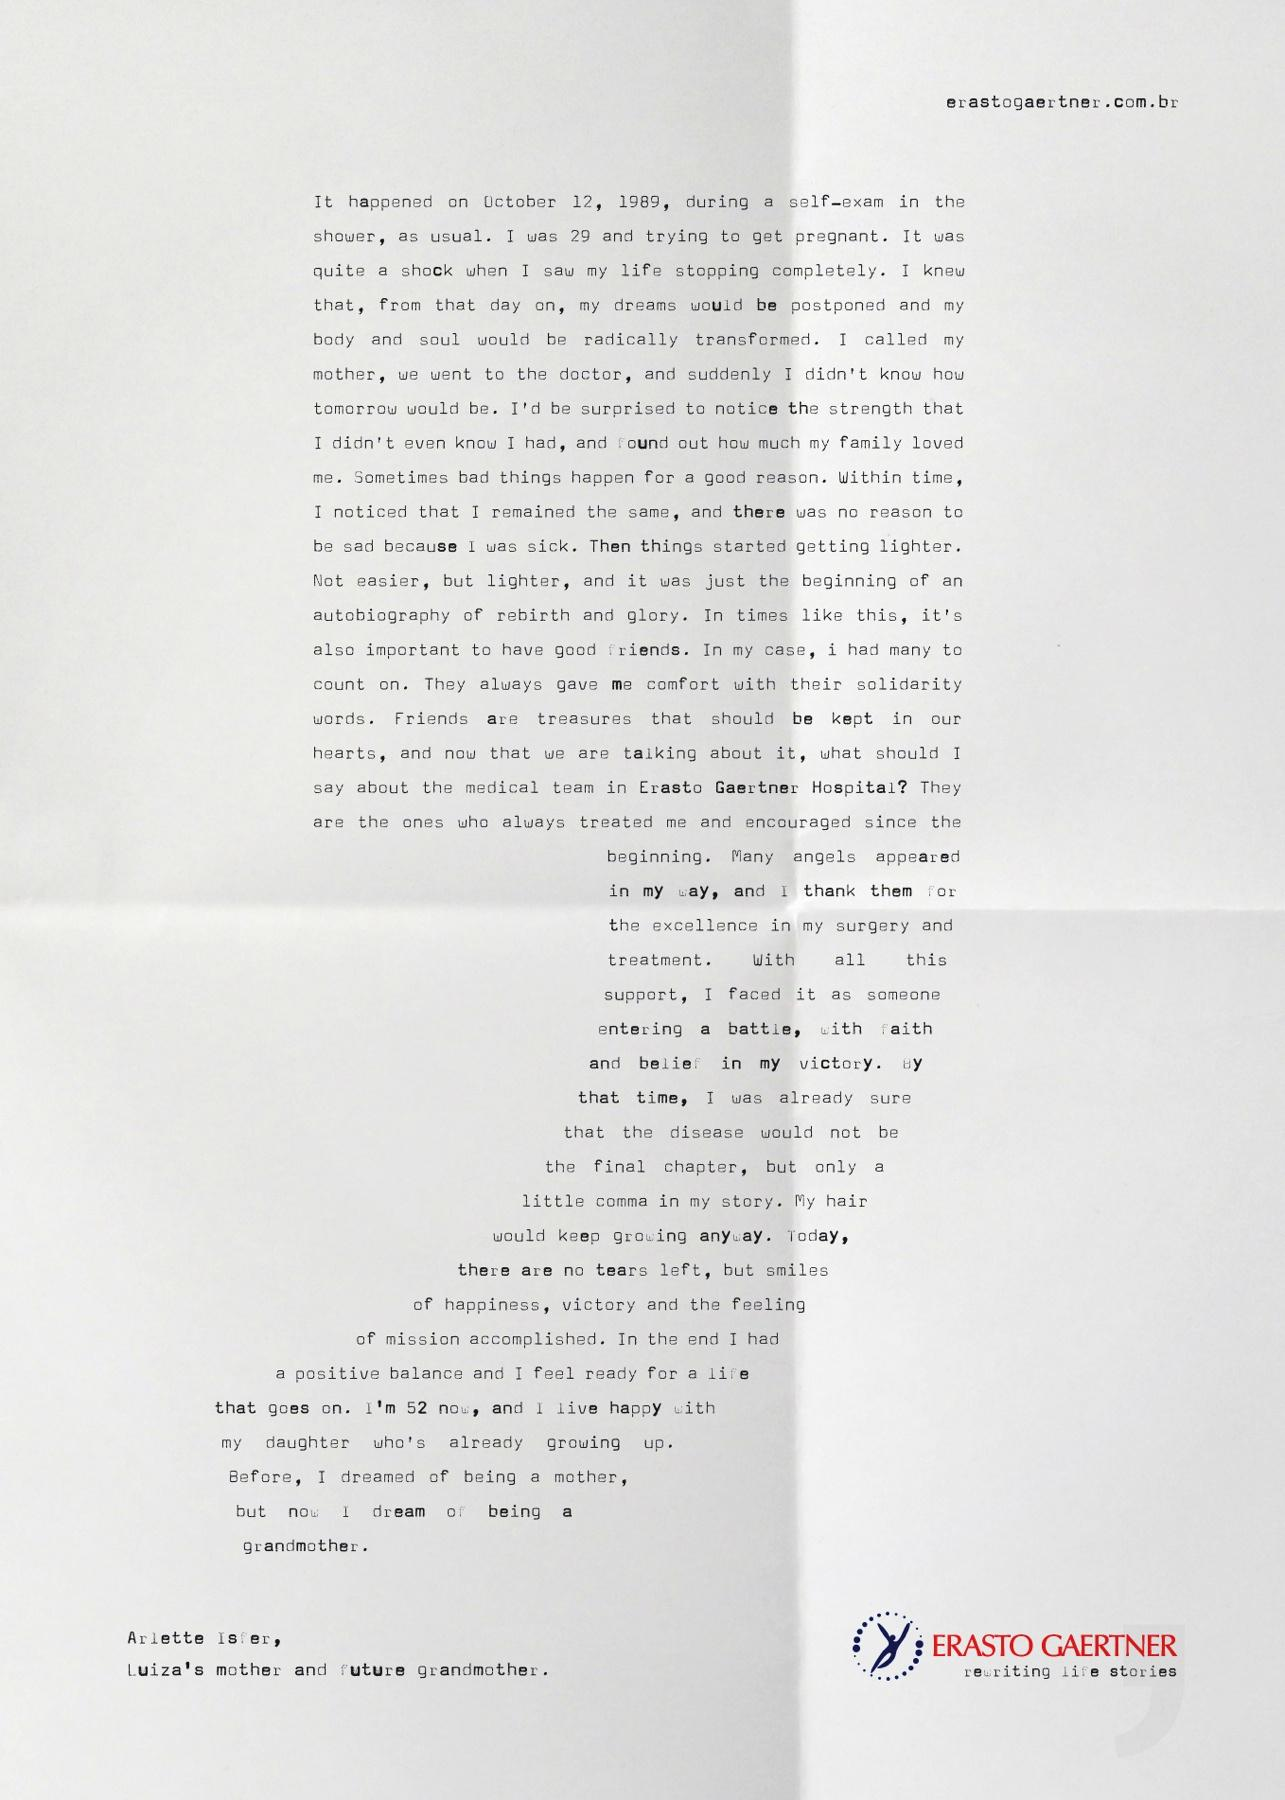 Hospital Erasto Gaertner Print Ad -  Rewriting life stories